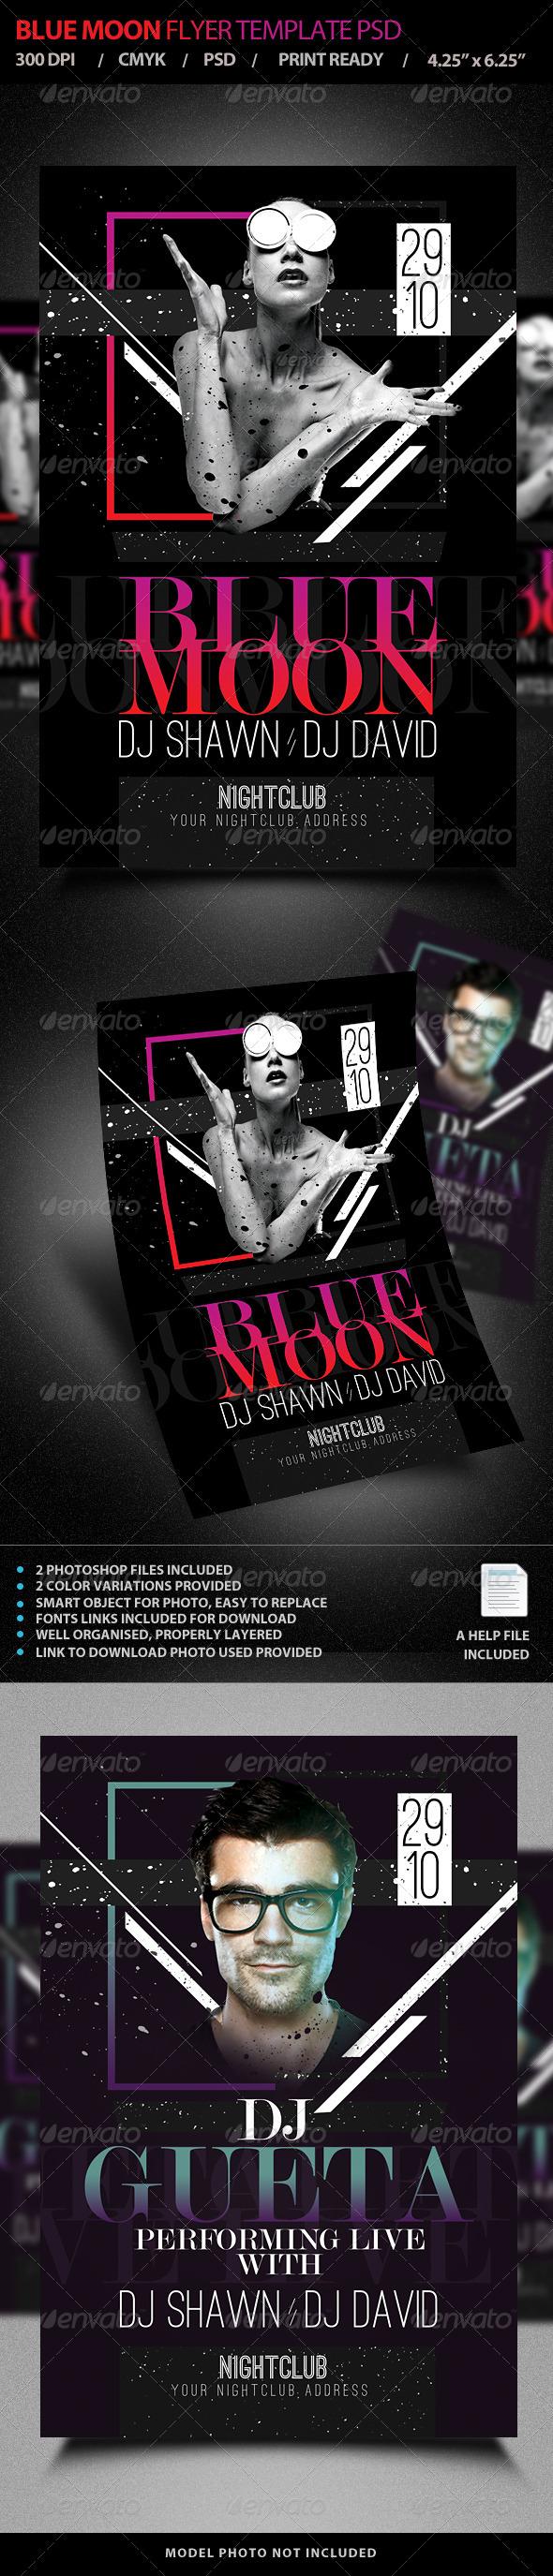 GraphicRiver Blue Moon Live DJ Flyer Template PSD V4 7721136